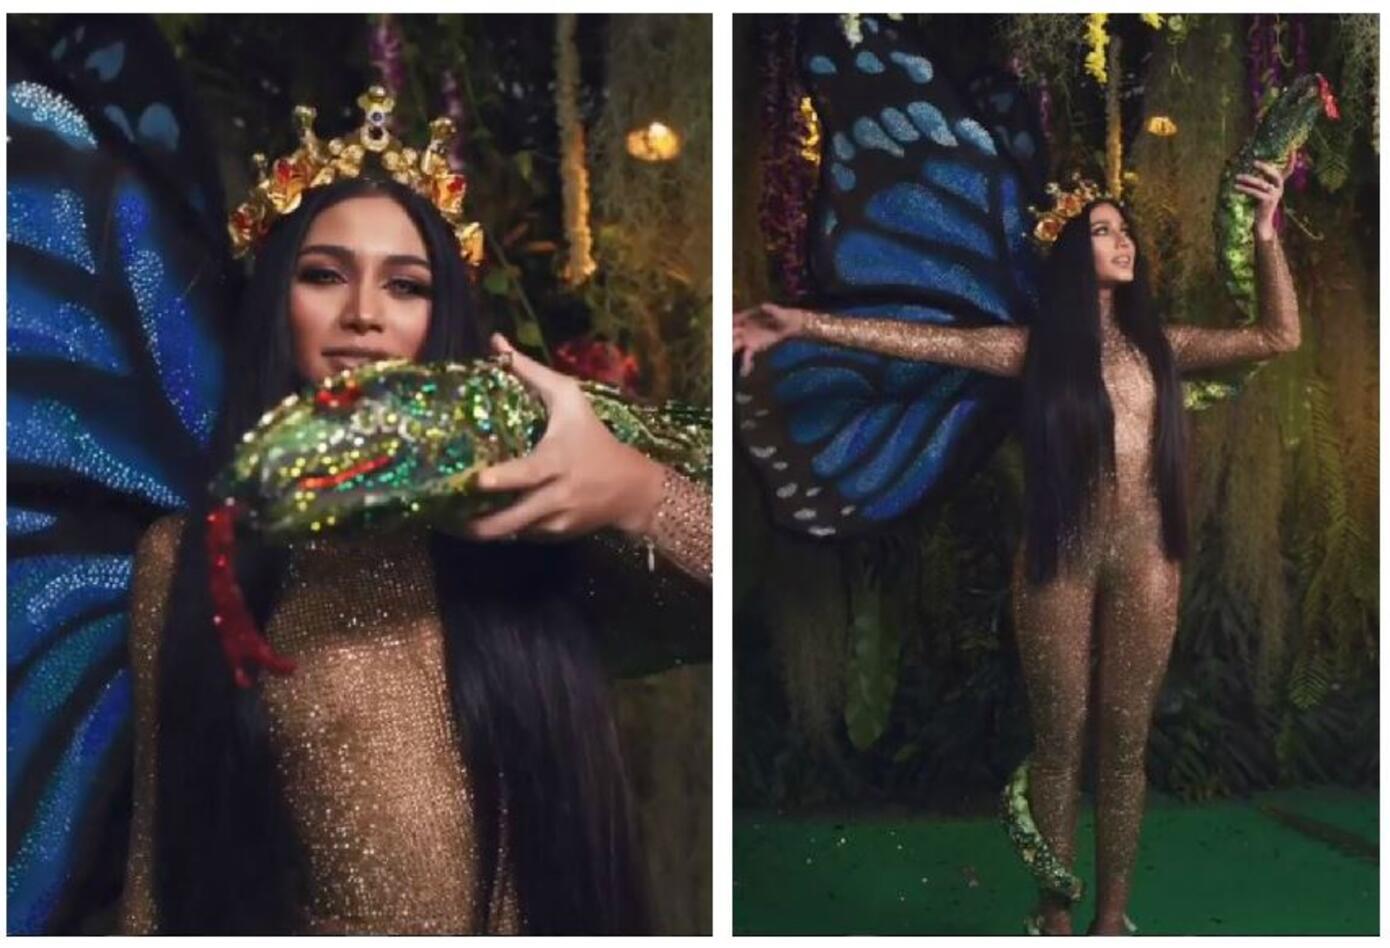 Traje típico de Sthefany Gutiérrez, Miss Venezuela